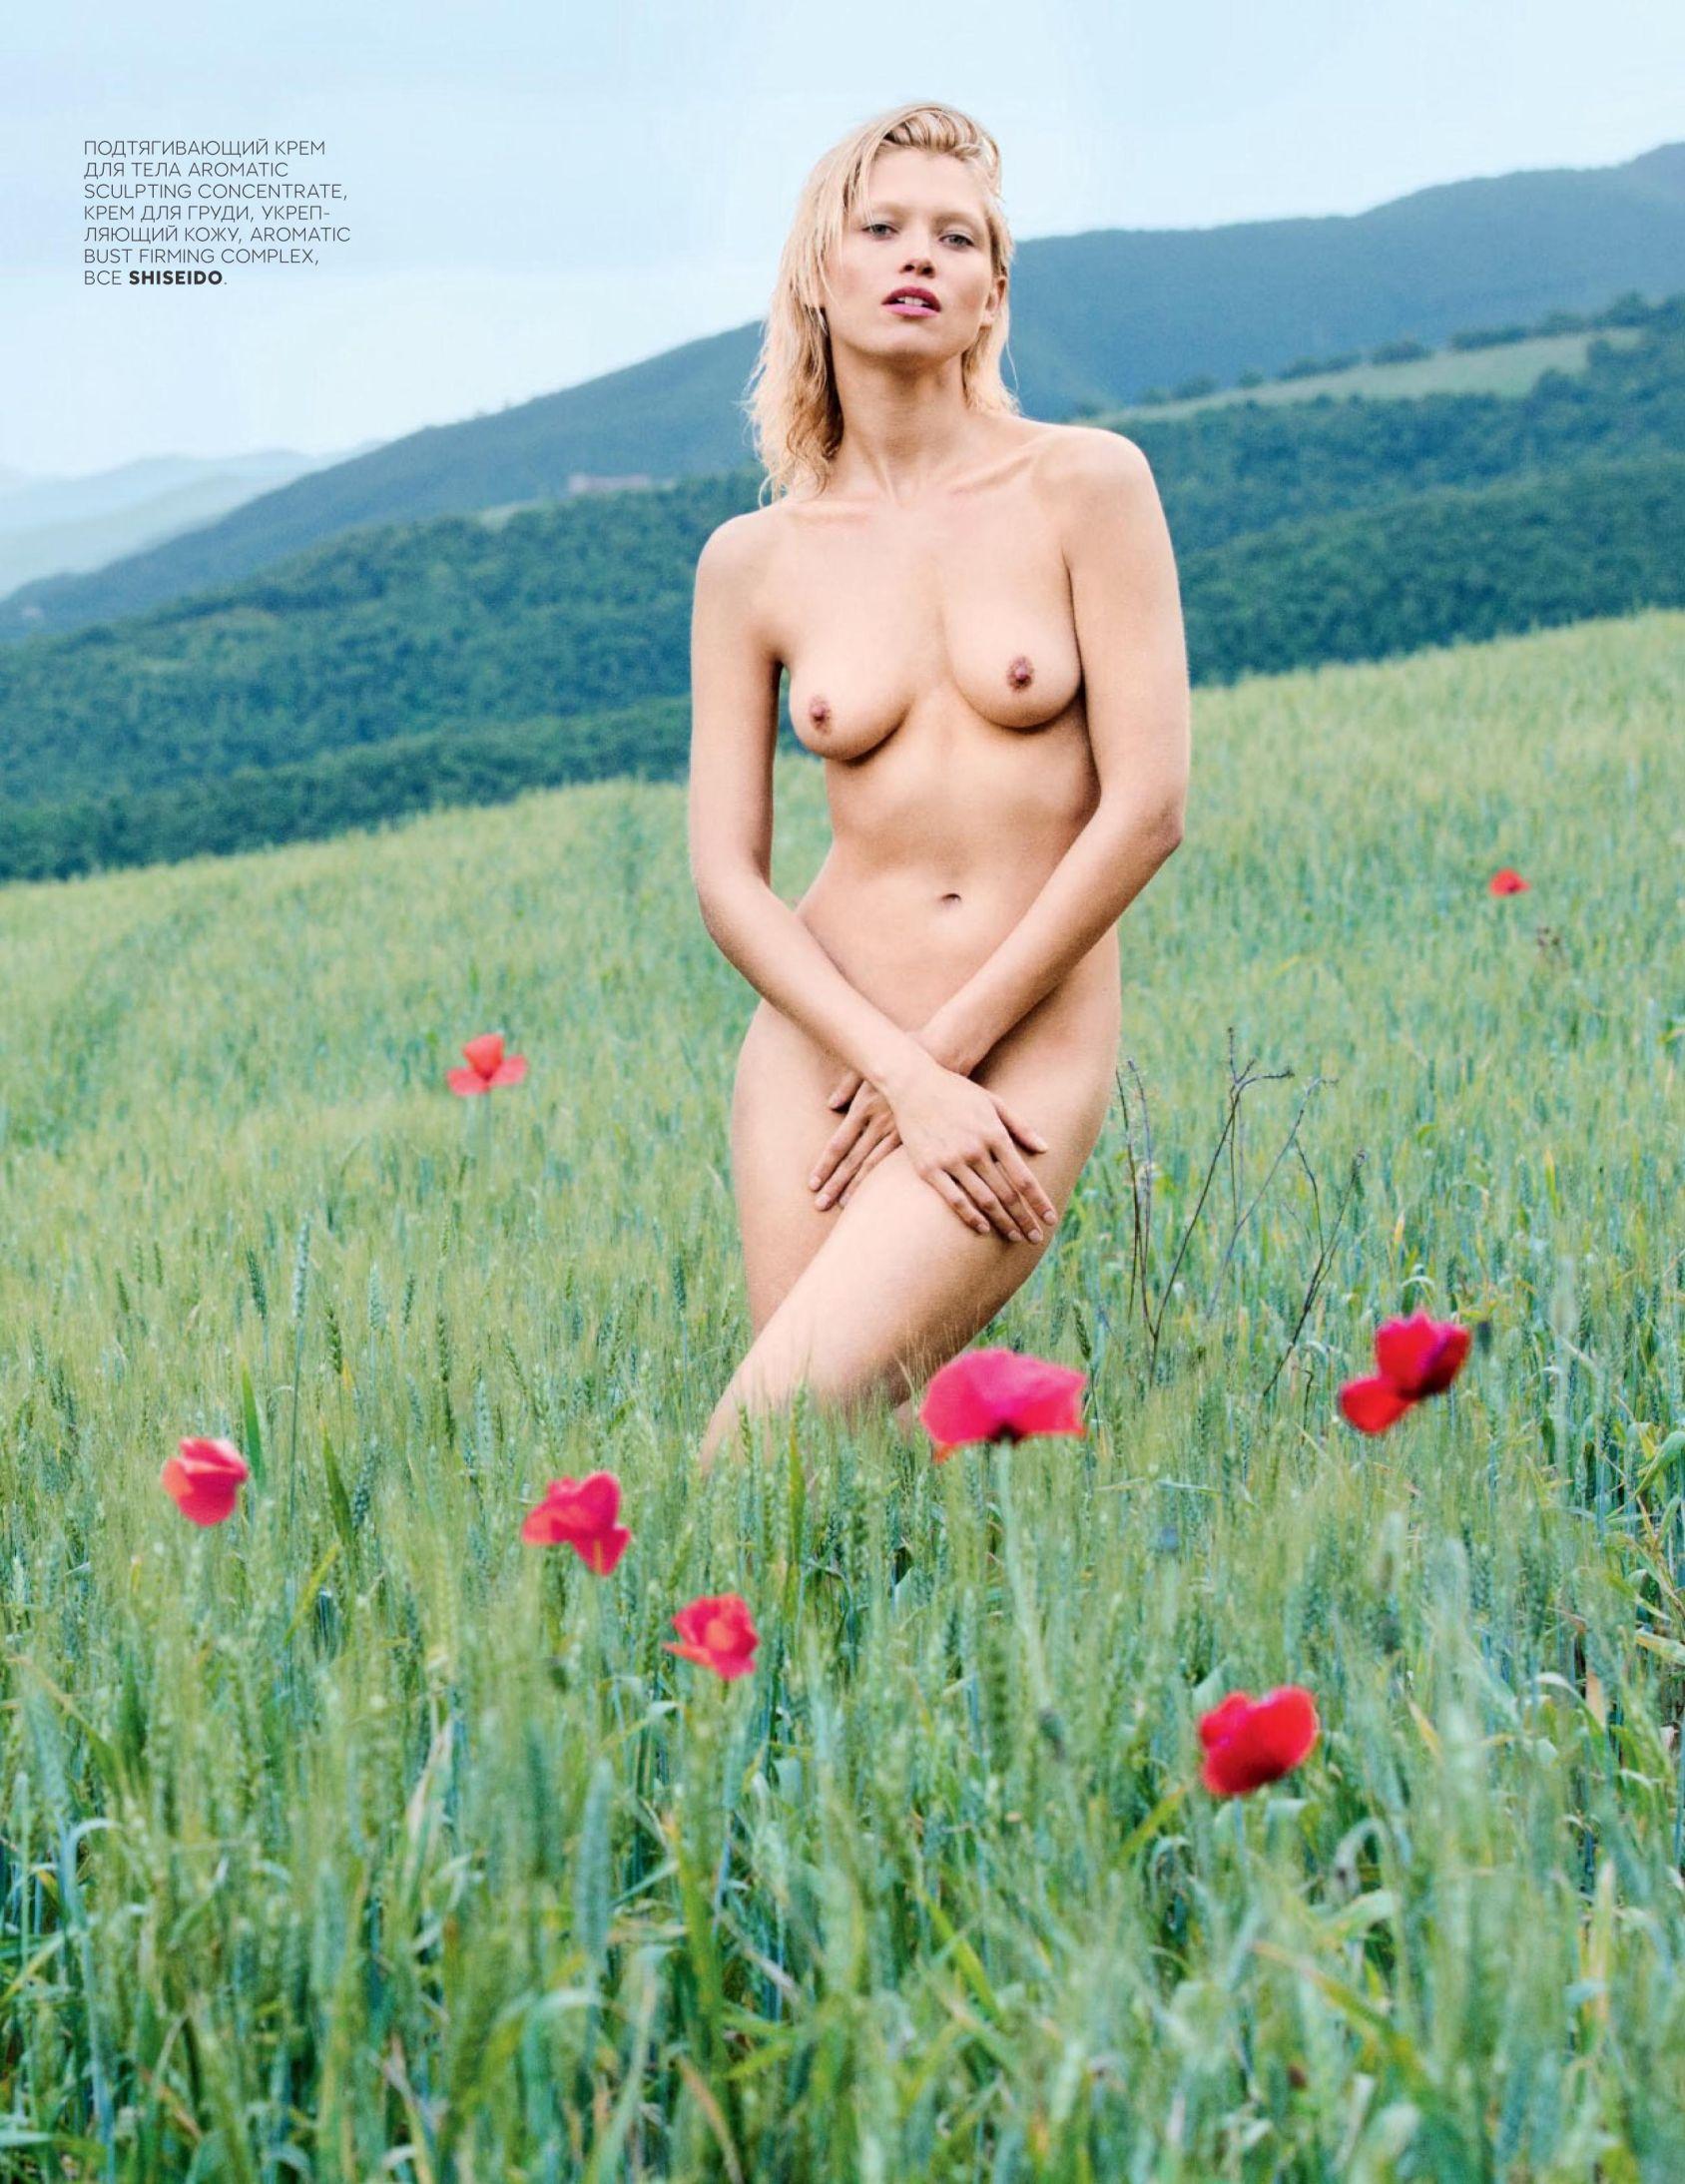 Hana-Jirickova-Nude-1